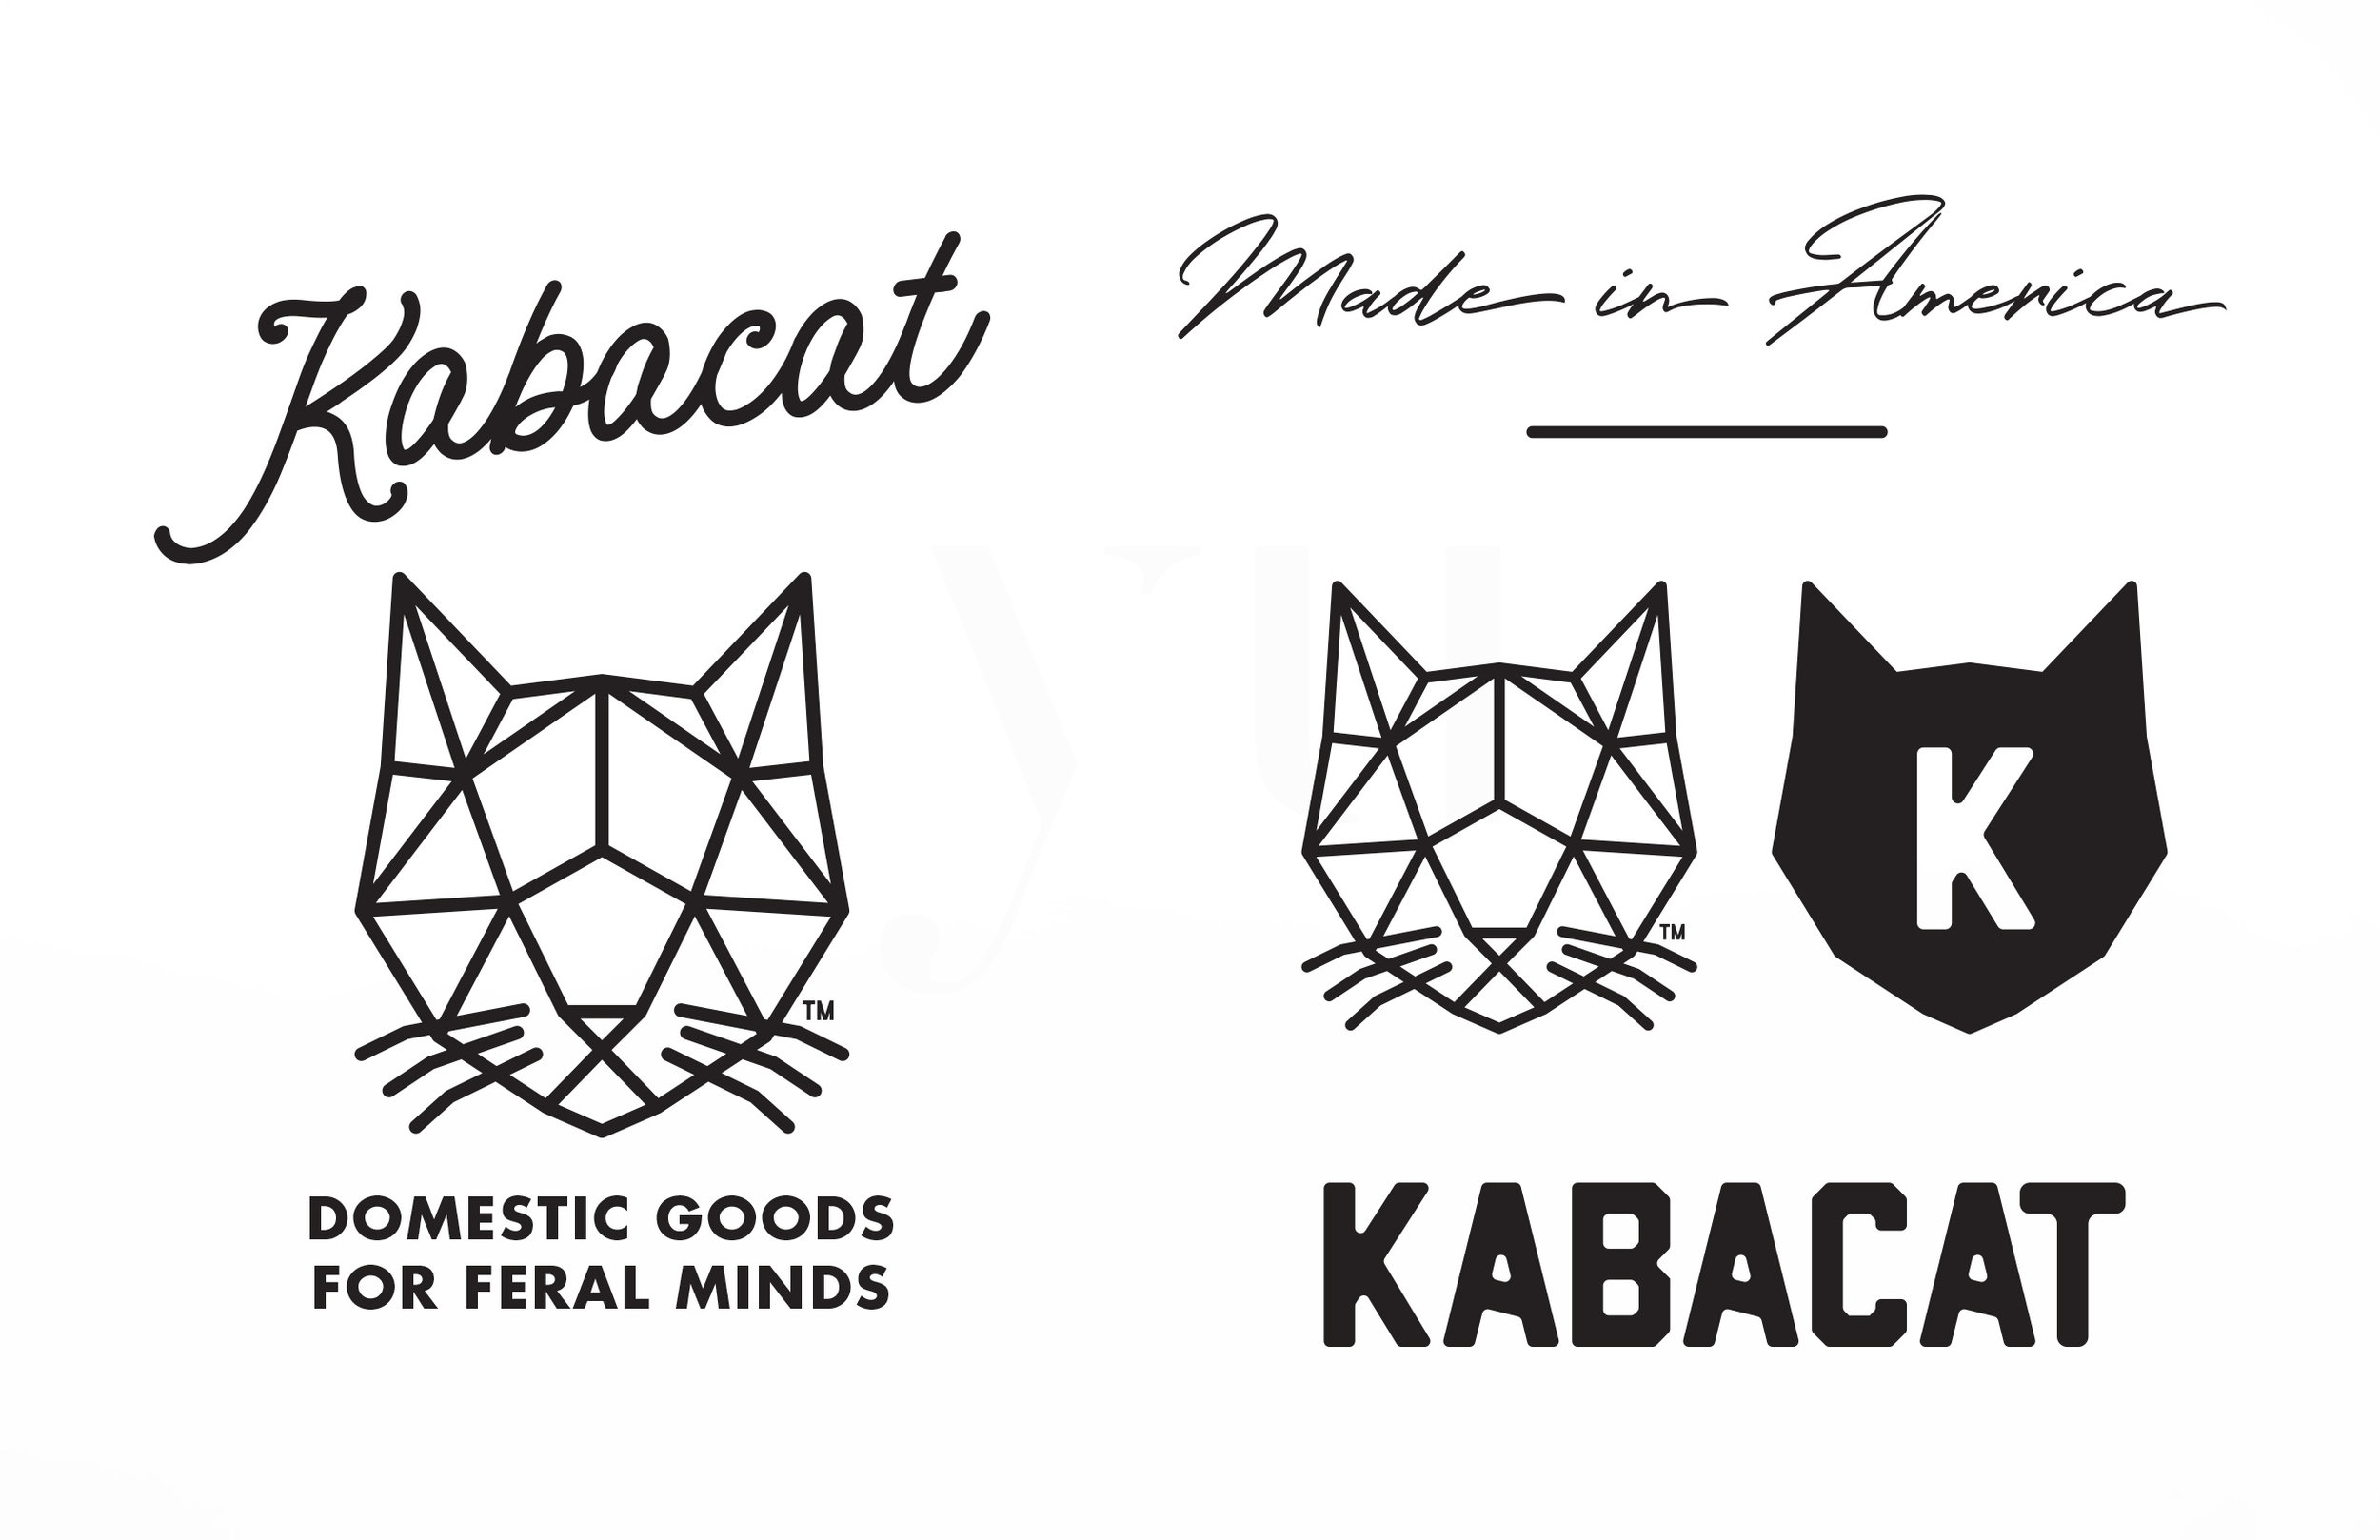 kabacat-design-elements-ben-rummel-design.jpg